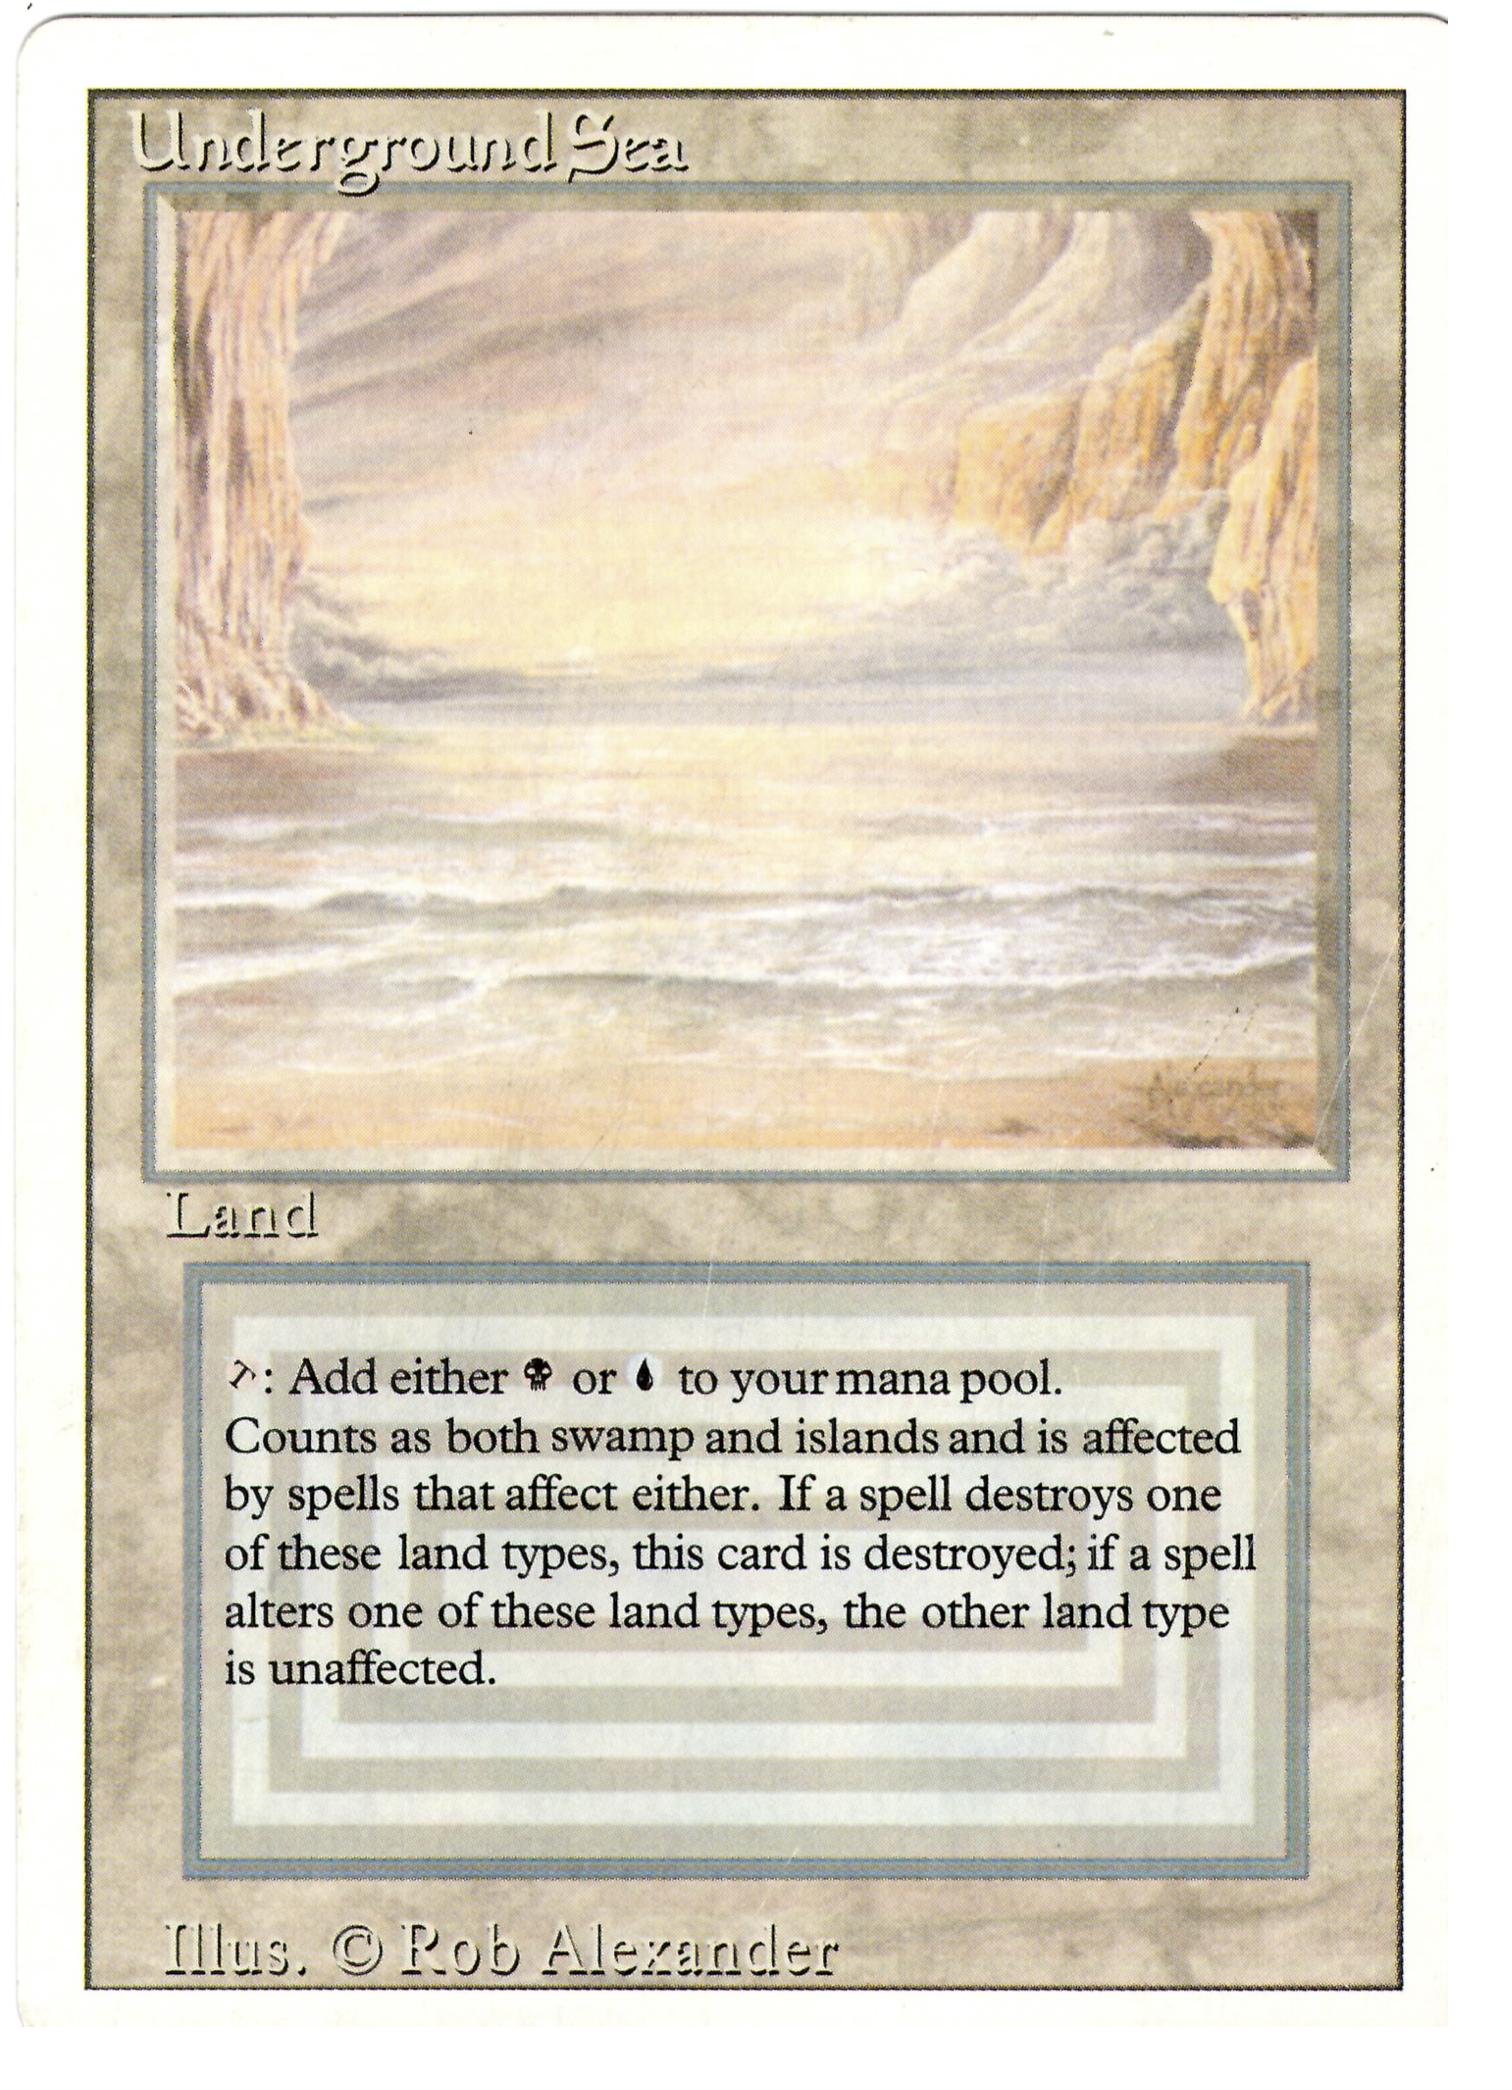 Fake Underground Sea from Ebay - Card Authentication ...